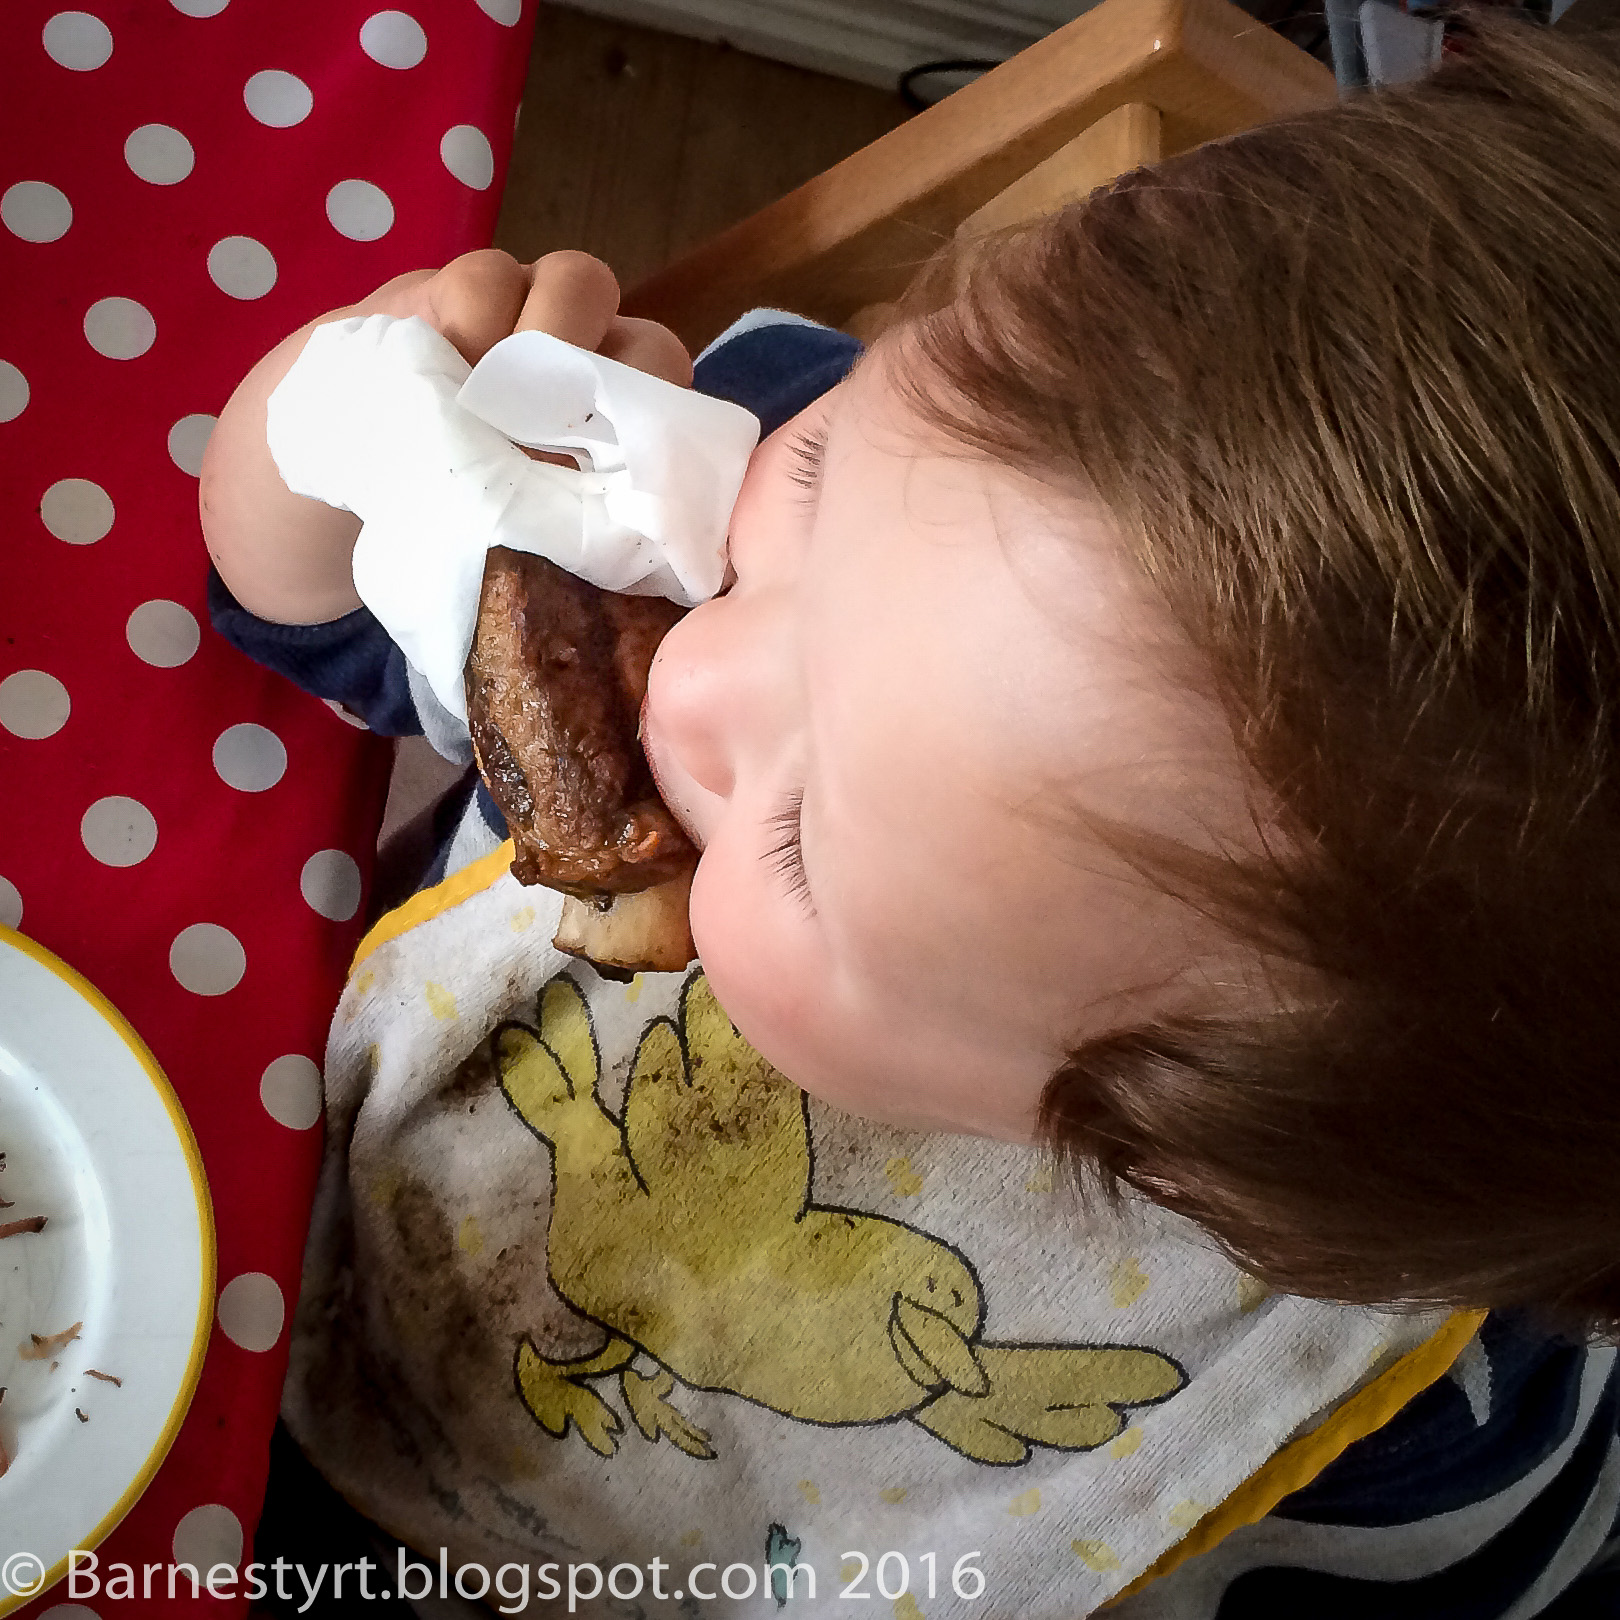 Barnestyrt spising av ribbe